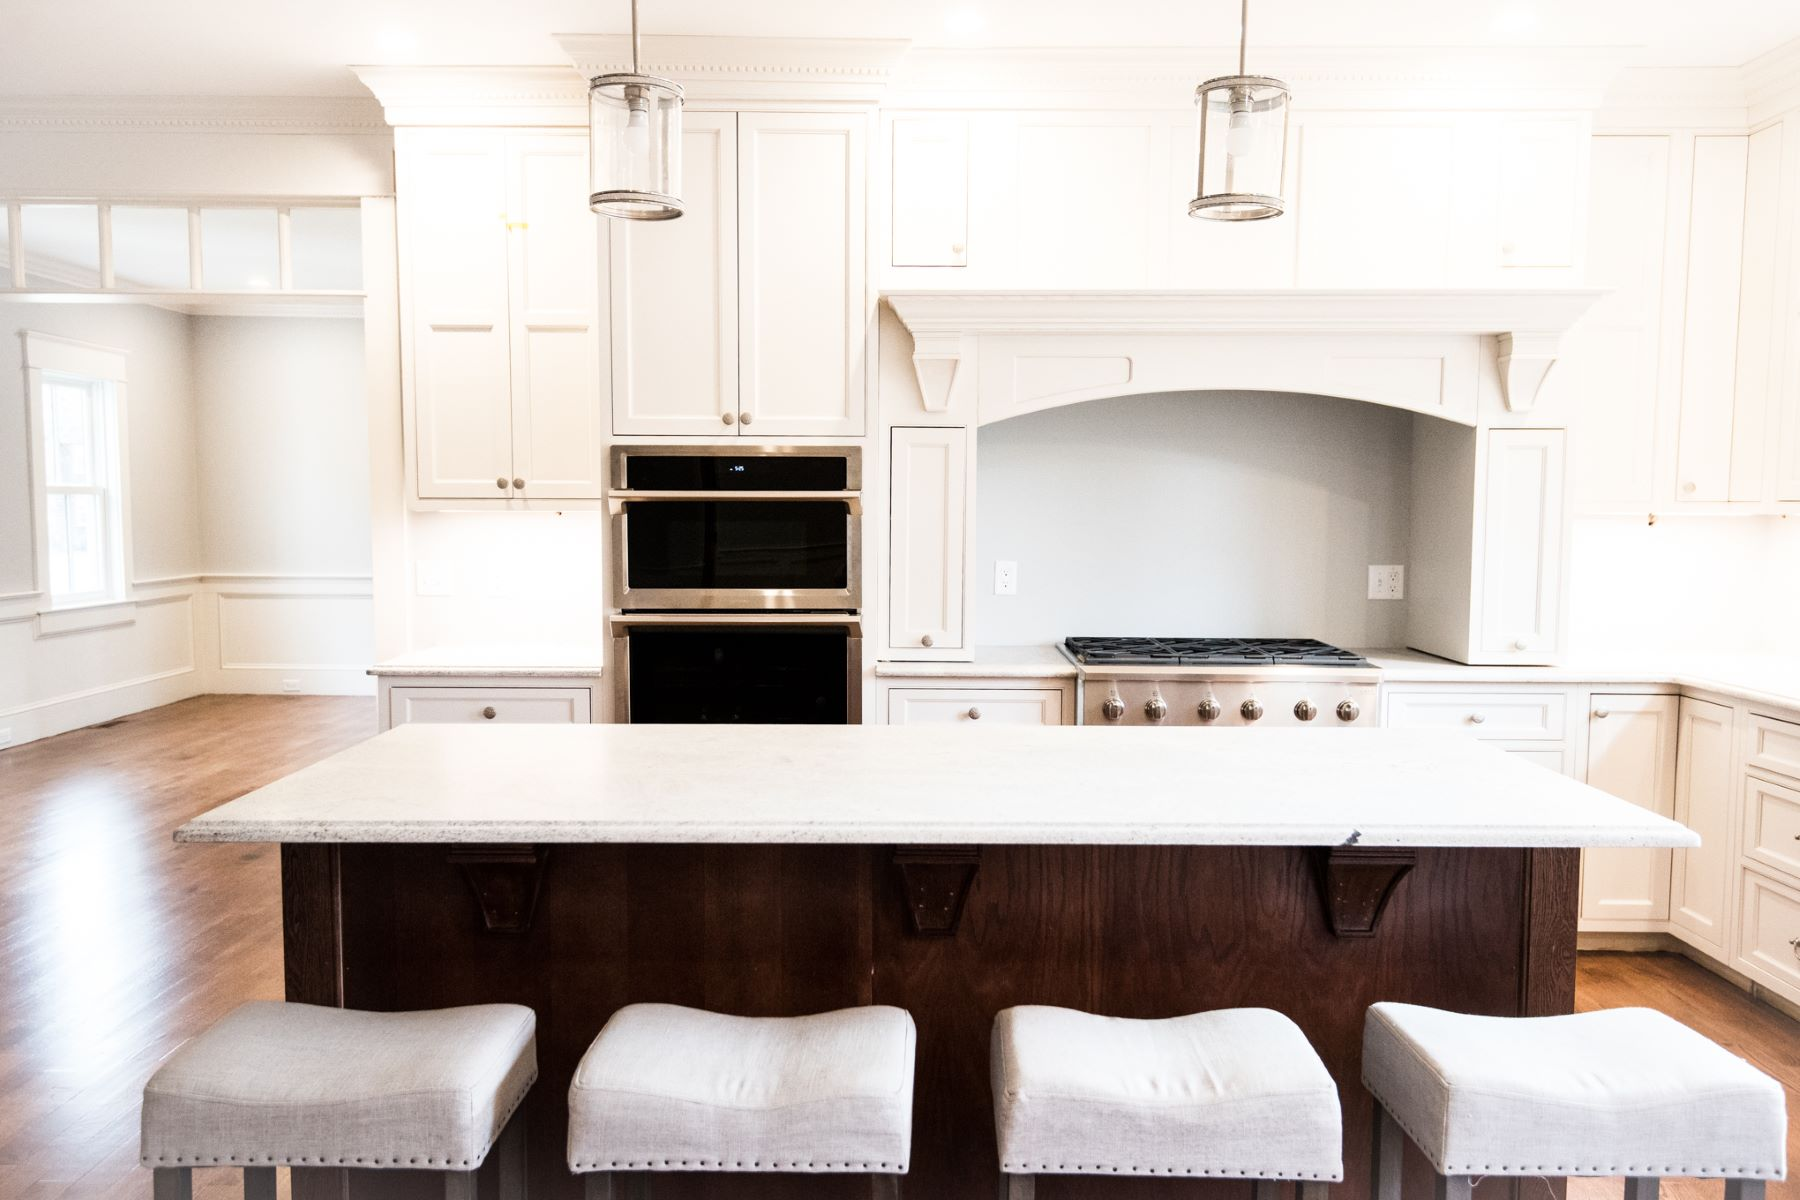 Single Family Homes για την Πώληση στο 1007 Main Street Hingham, Μασαχουσετη 02043 Ηνωμένες Πολιτείες